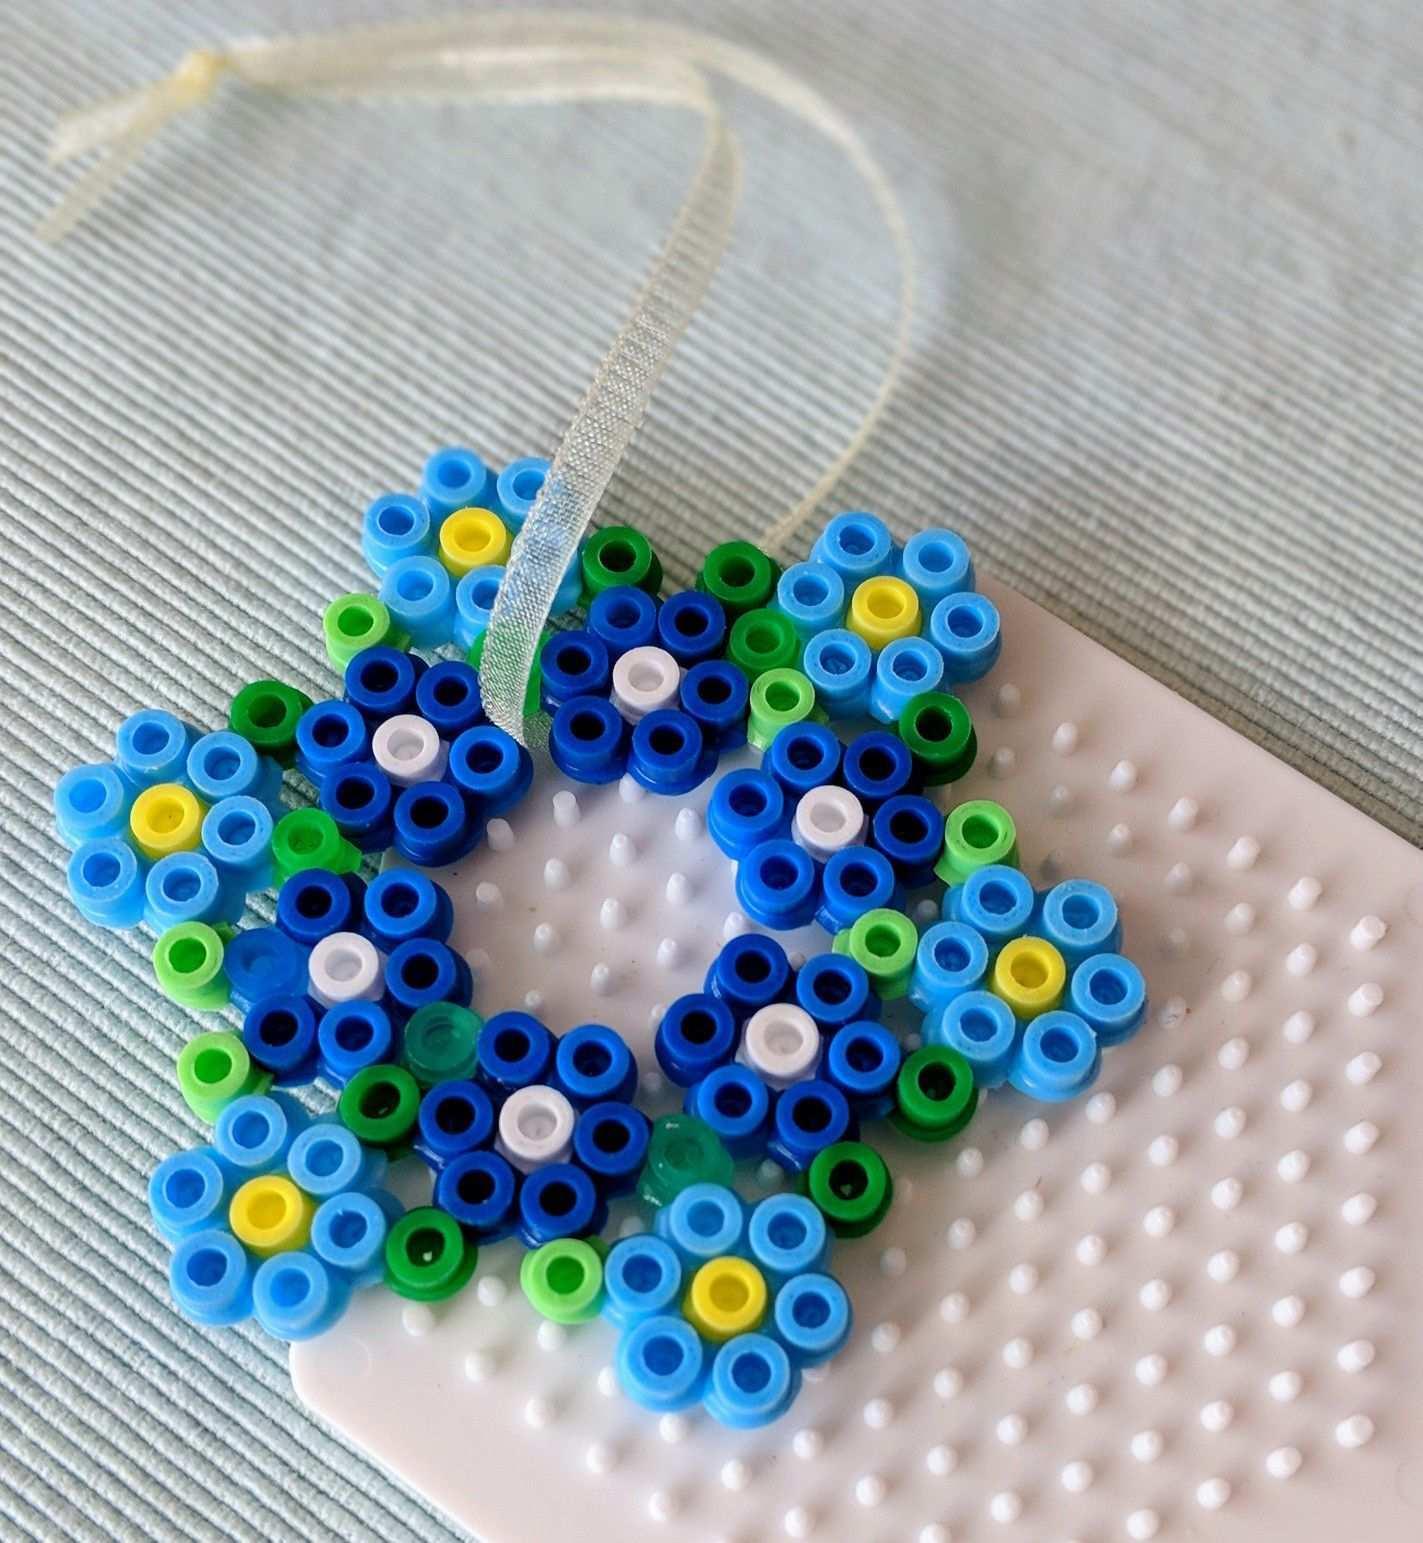 Bugelperlen Kleiner Kranz Blaue Blumchen Eisenperlen Basteln Bugelperlen Perler Bead Designs